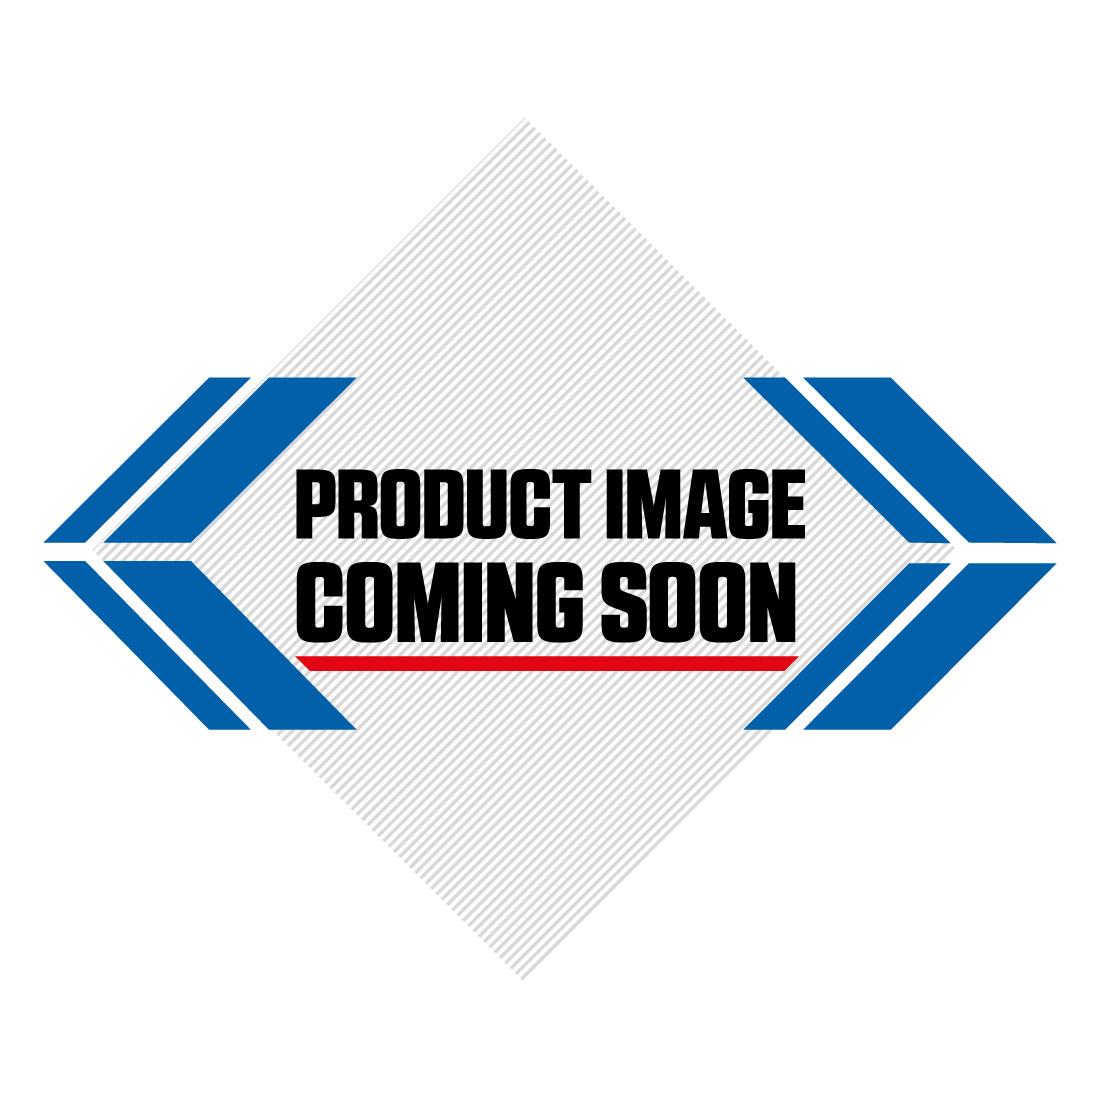 DJI Mavic 2 Pro Drone Image-7